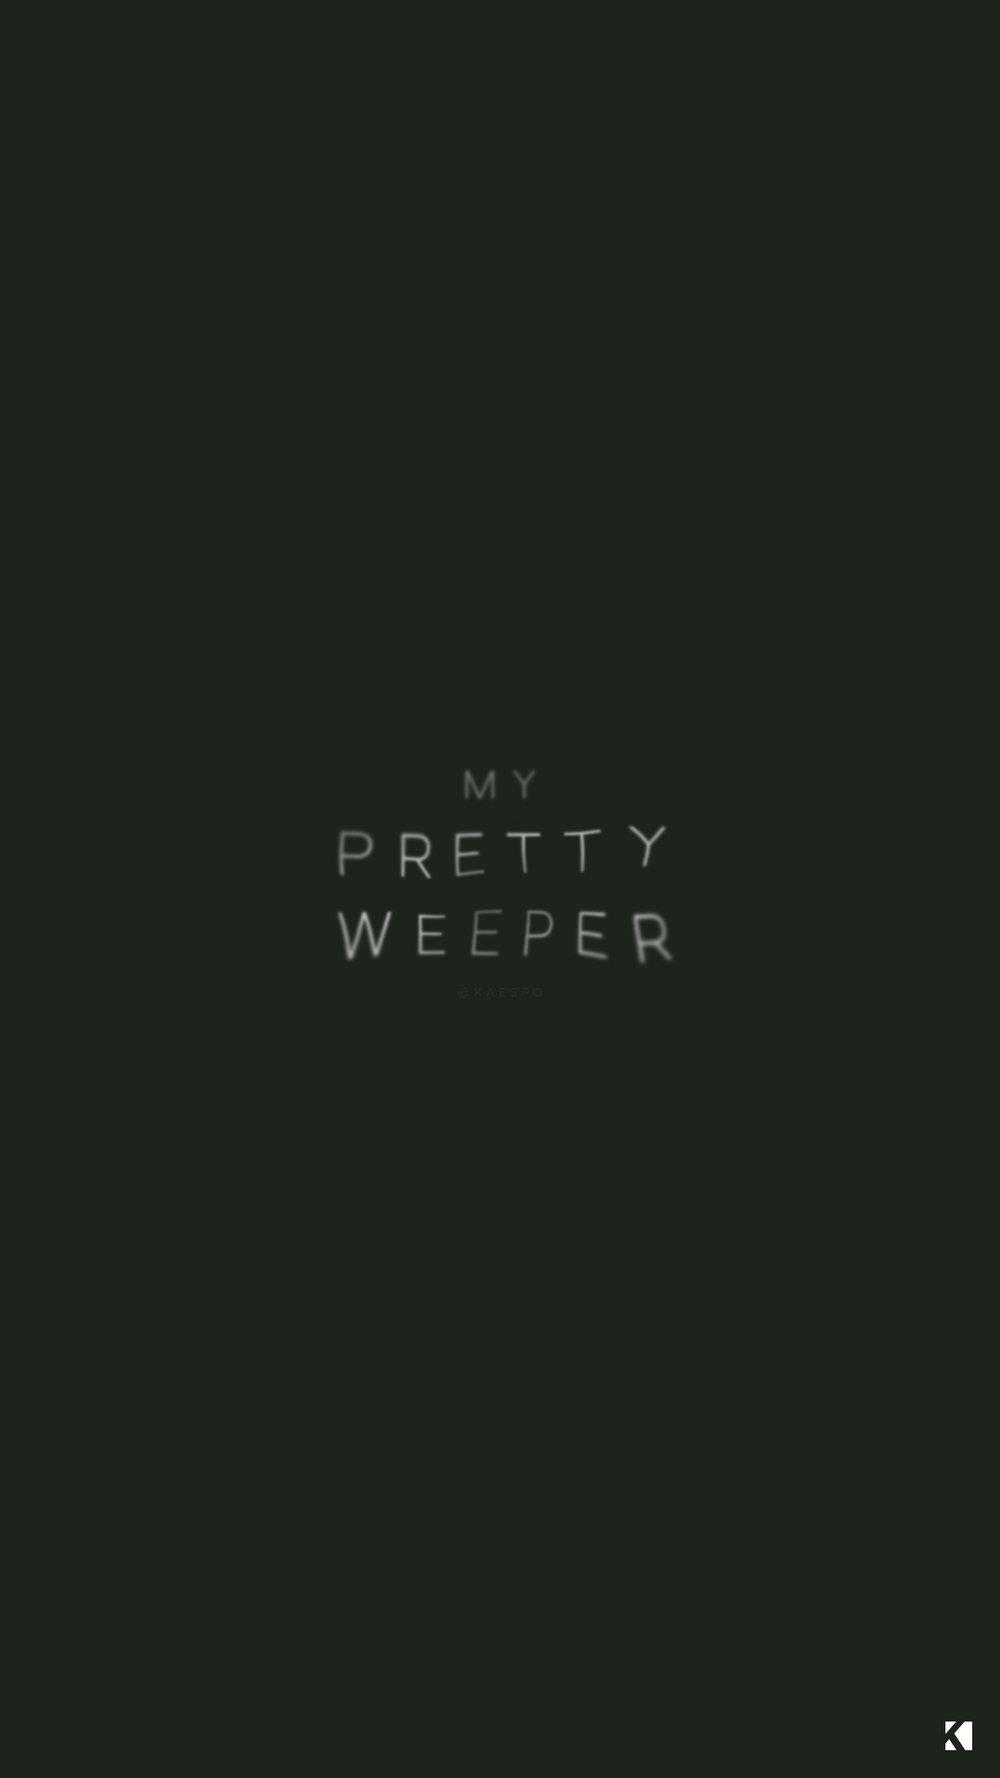 Oh Ms Believer Lyrics | Wallpapers by KAESPO Design